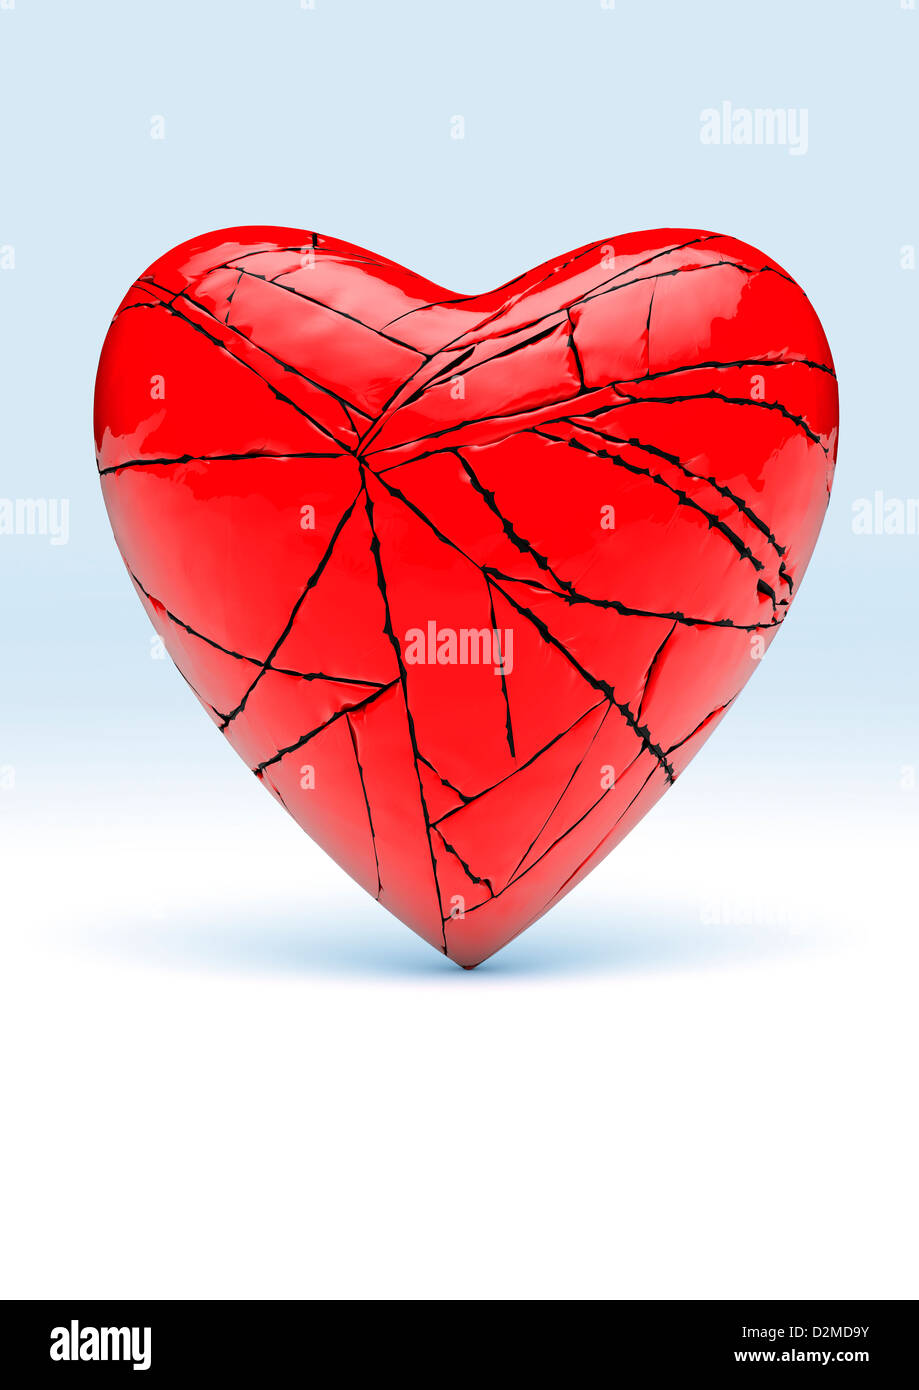 Heart broken - red love heart relationships / relationship break up concept - Stock Image